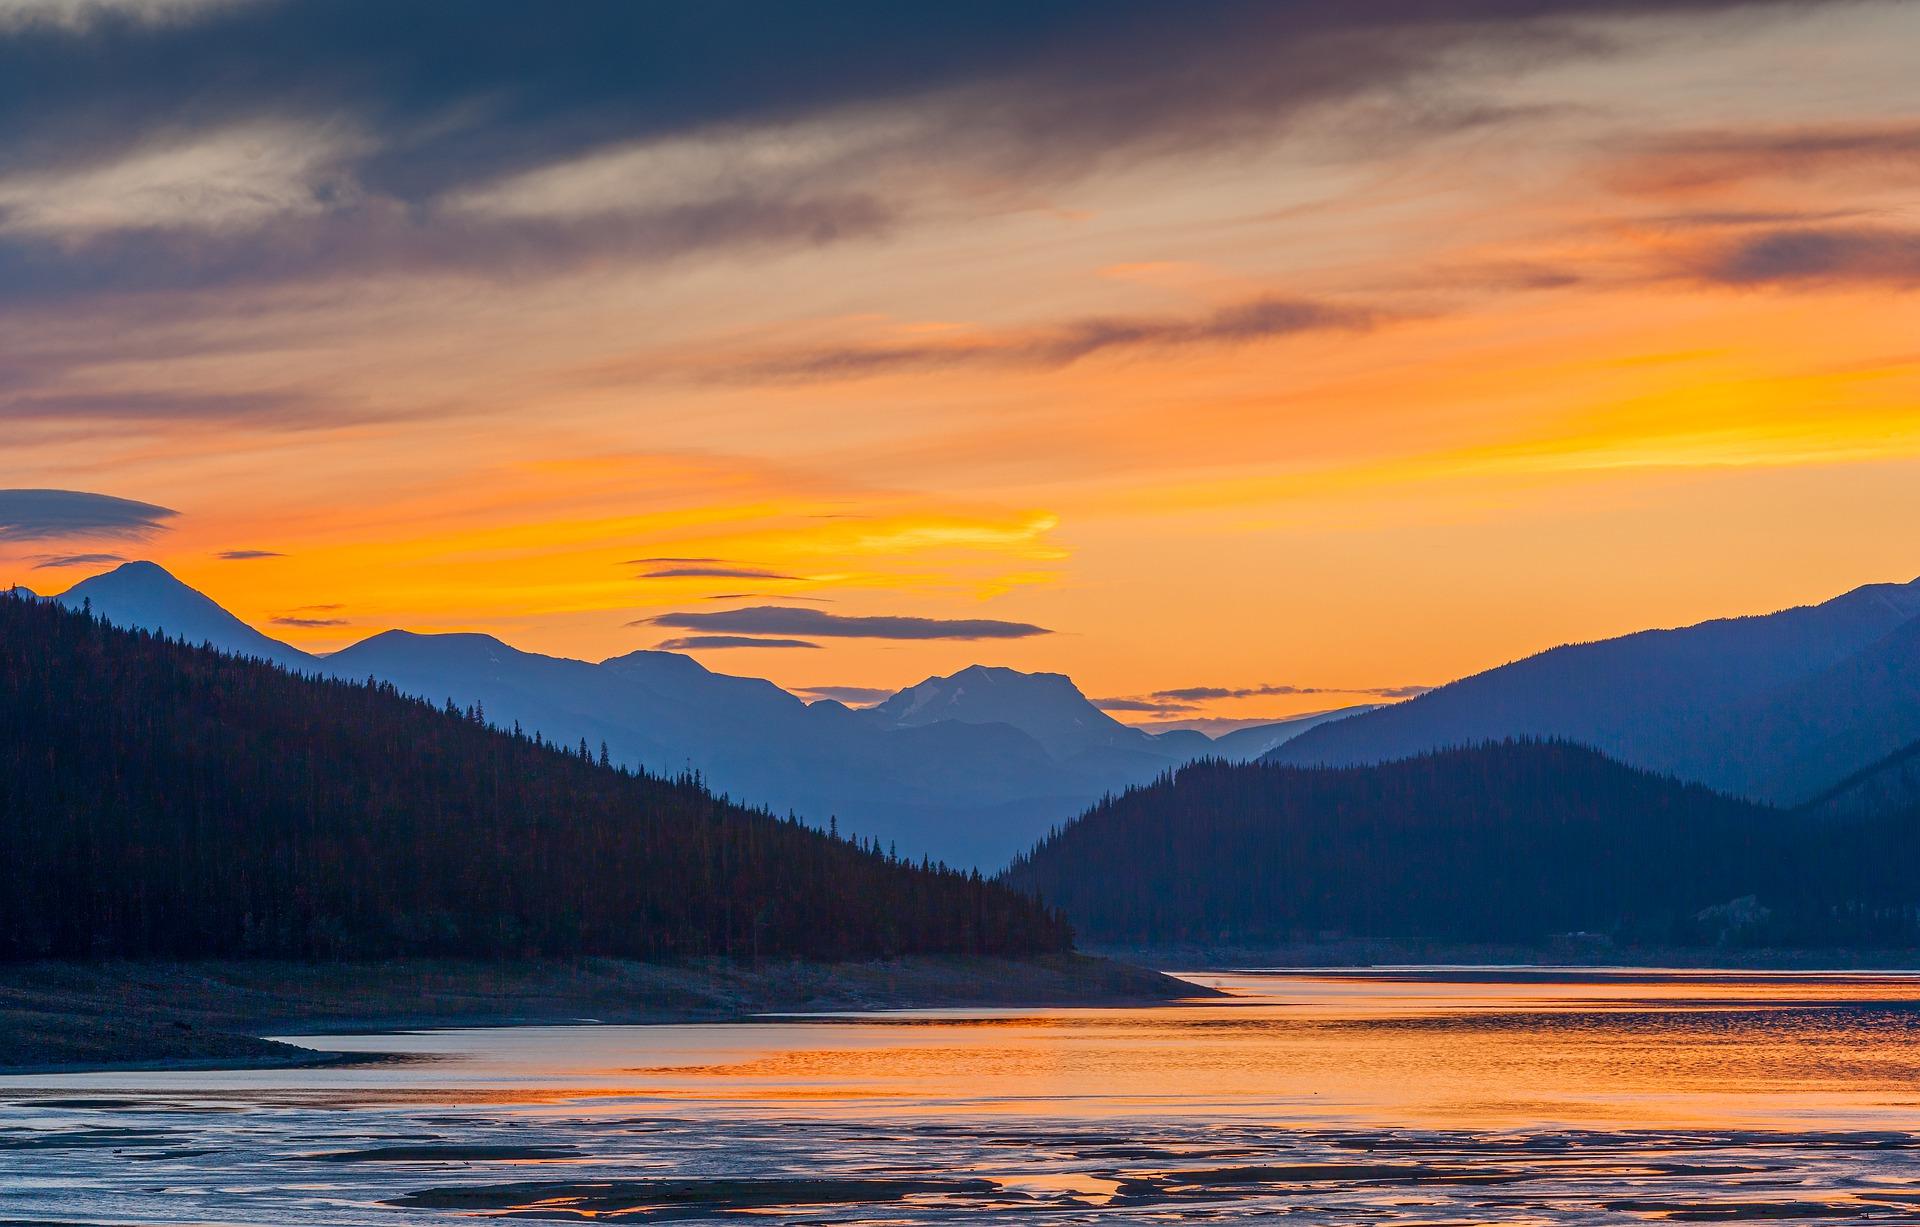 sunset-5800386_1920